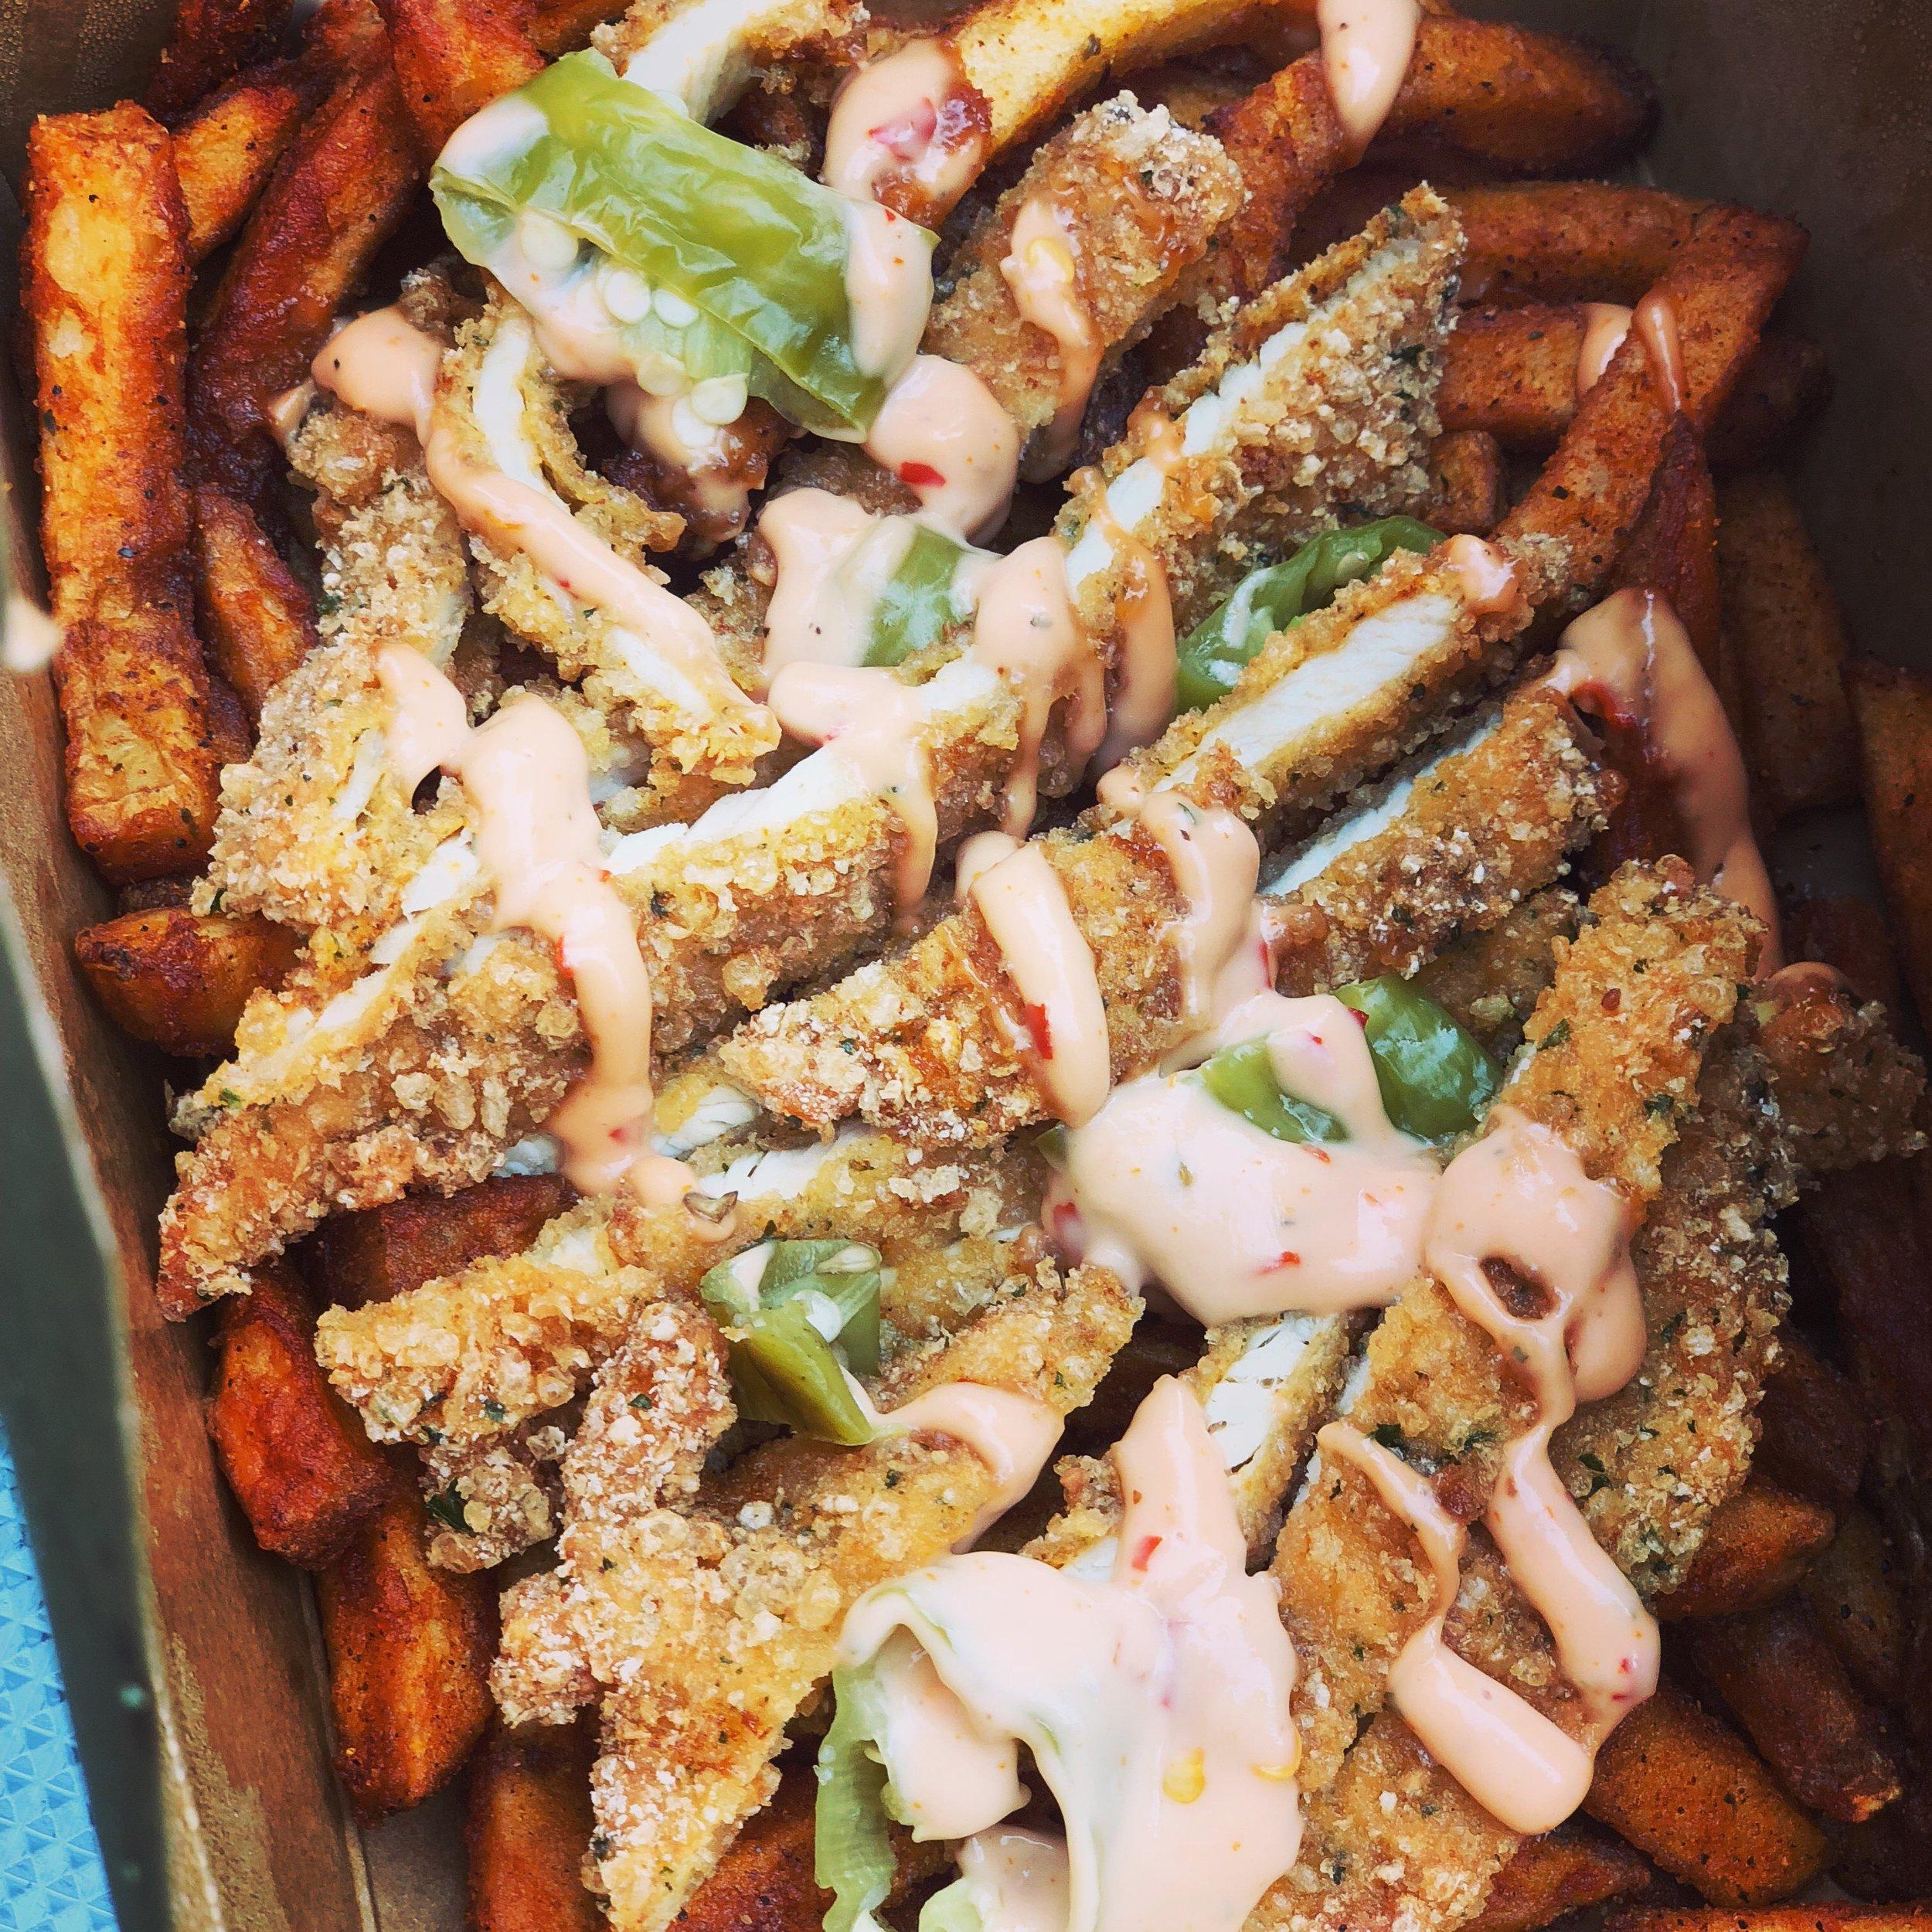 Foodie_NYPanini_Gnarly_Fries_.jpeg